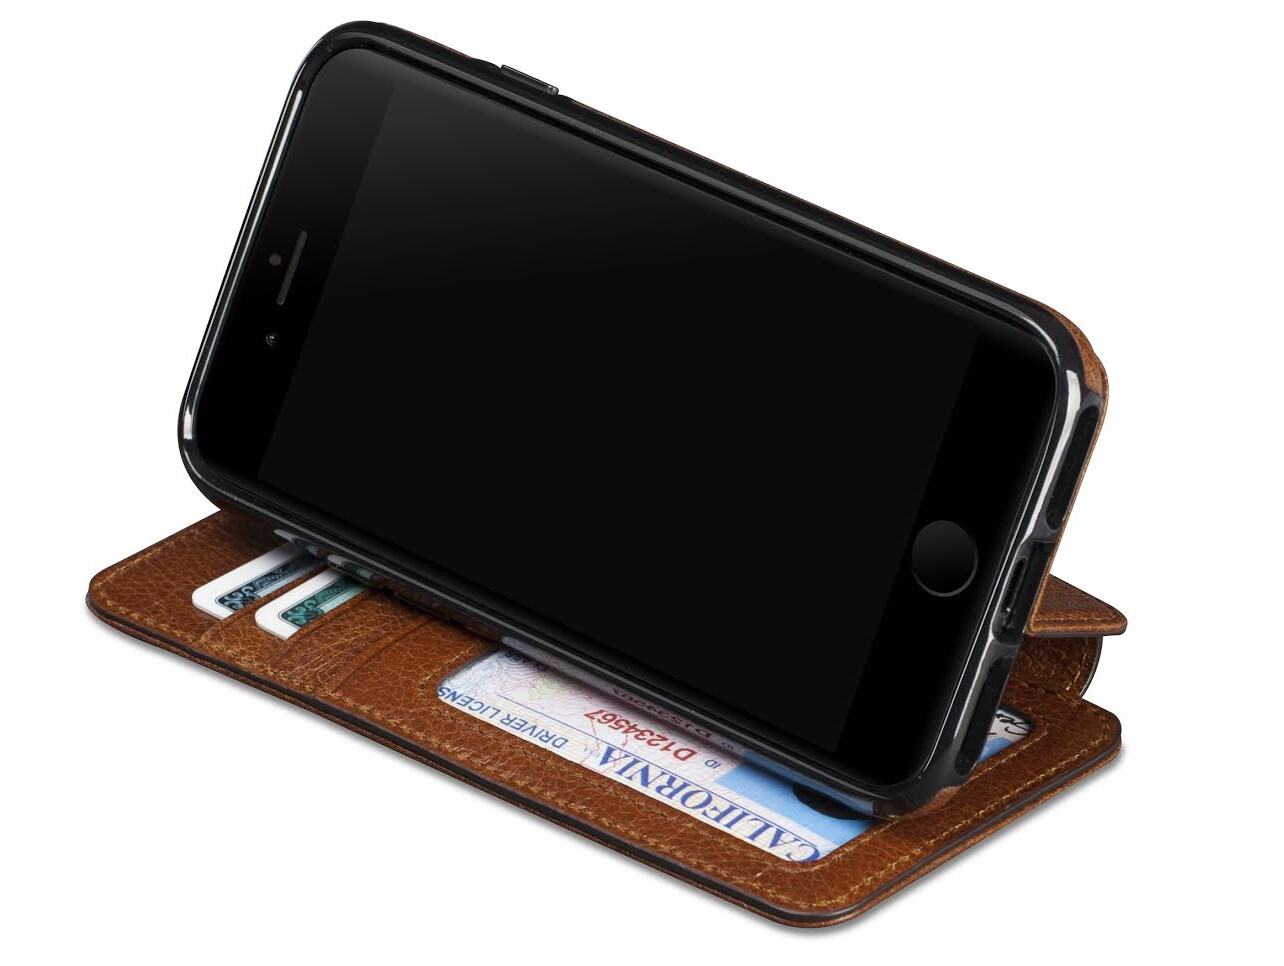 Image Result For Best Iphone Wallet Case